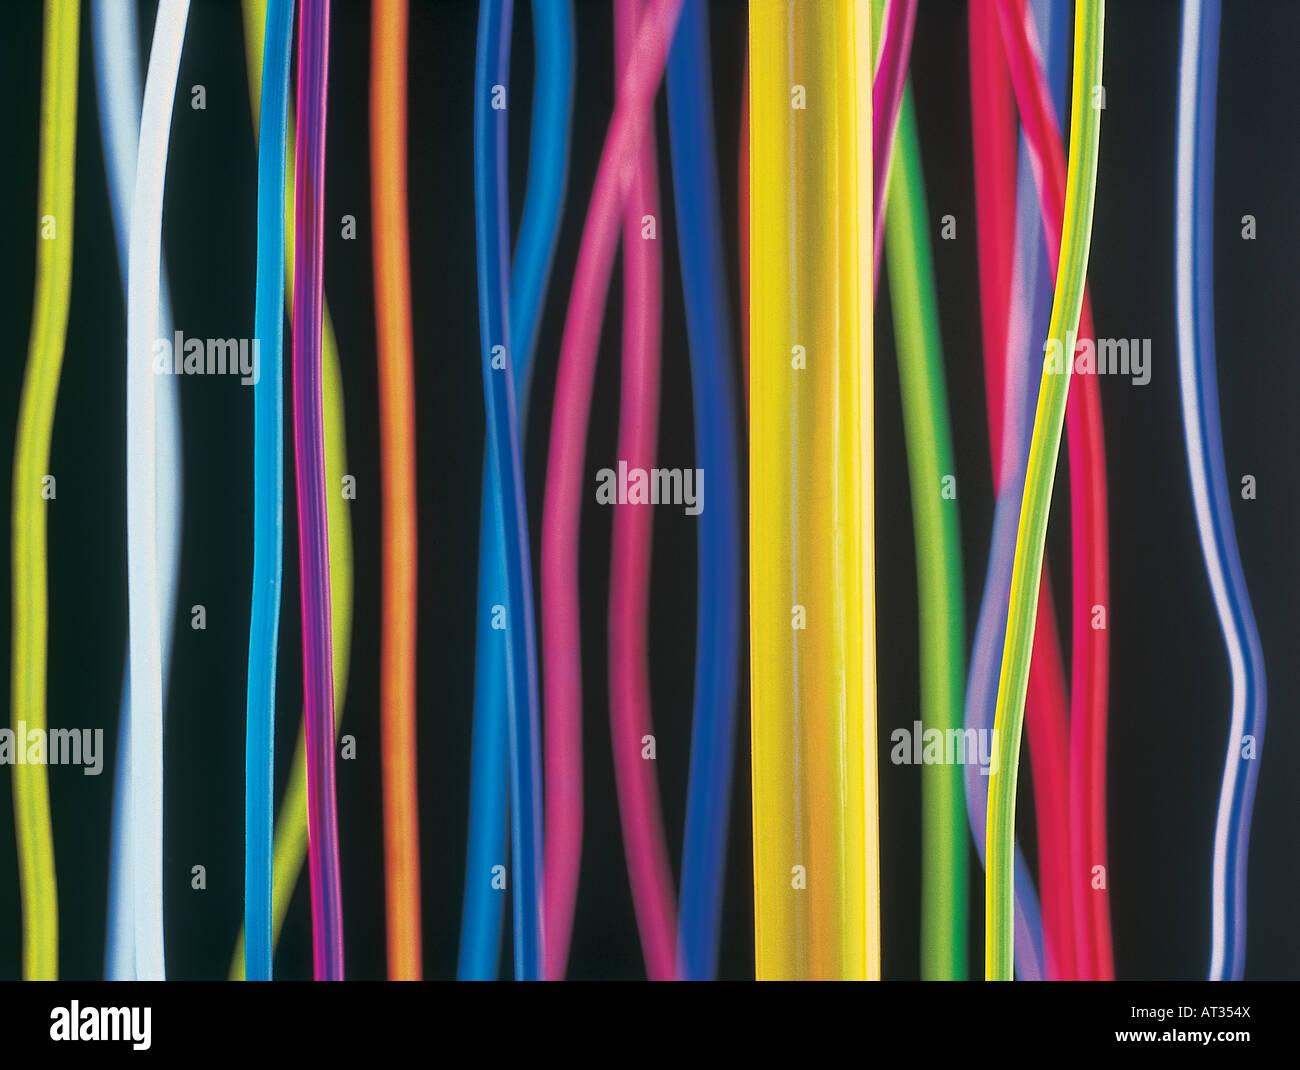 Imagen abstracta de cables de colores Imagen De Stock